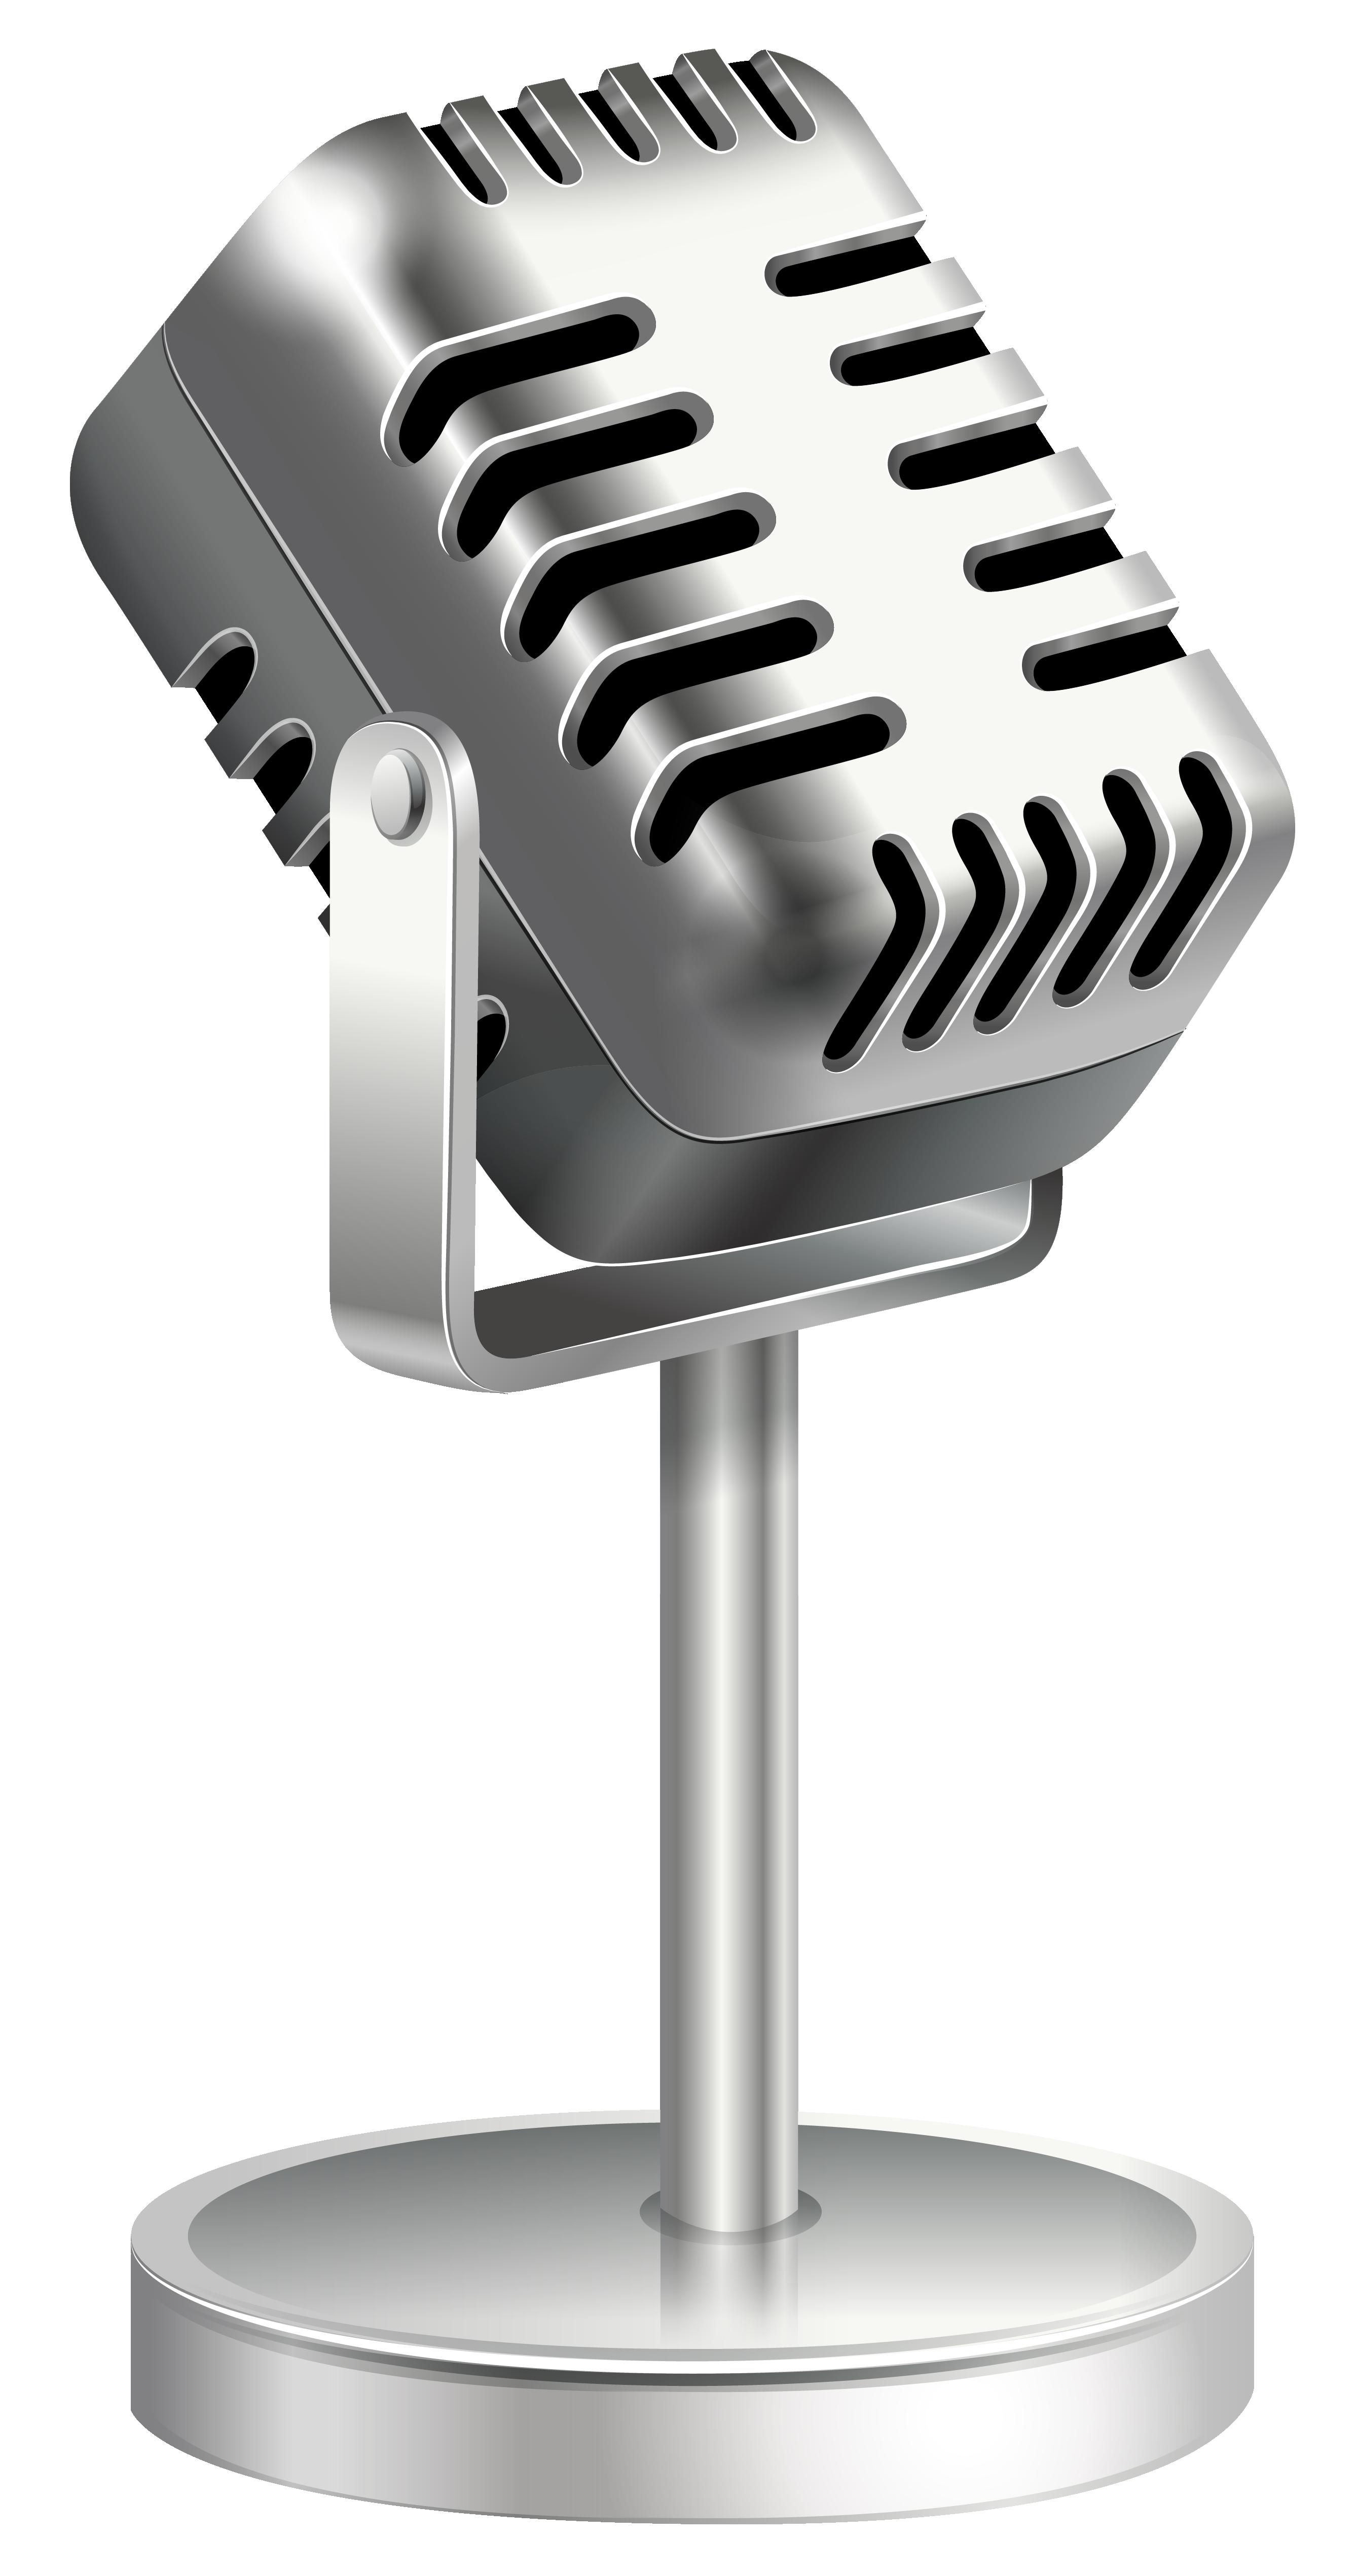 Retro microphone png image. Clipart studio mircophone